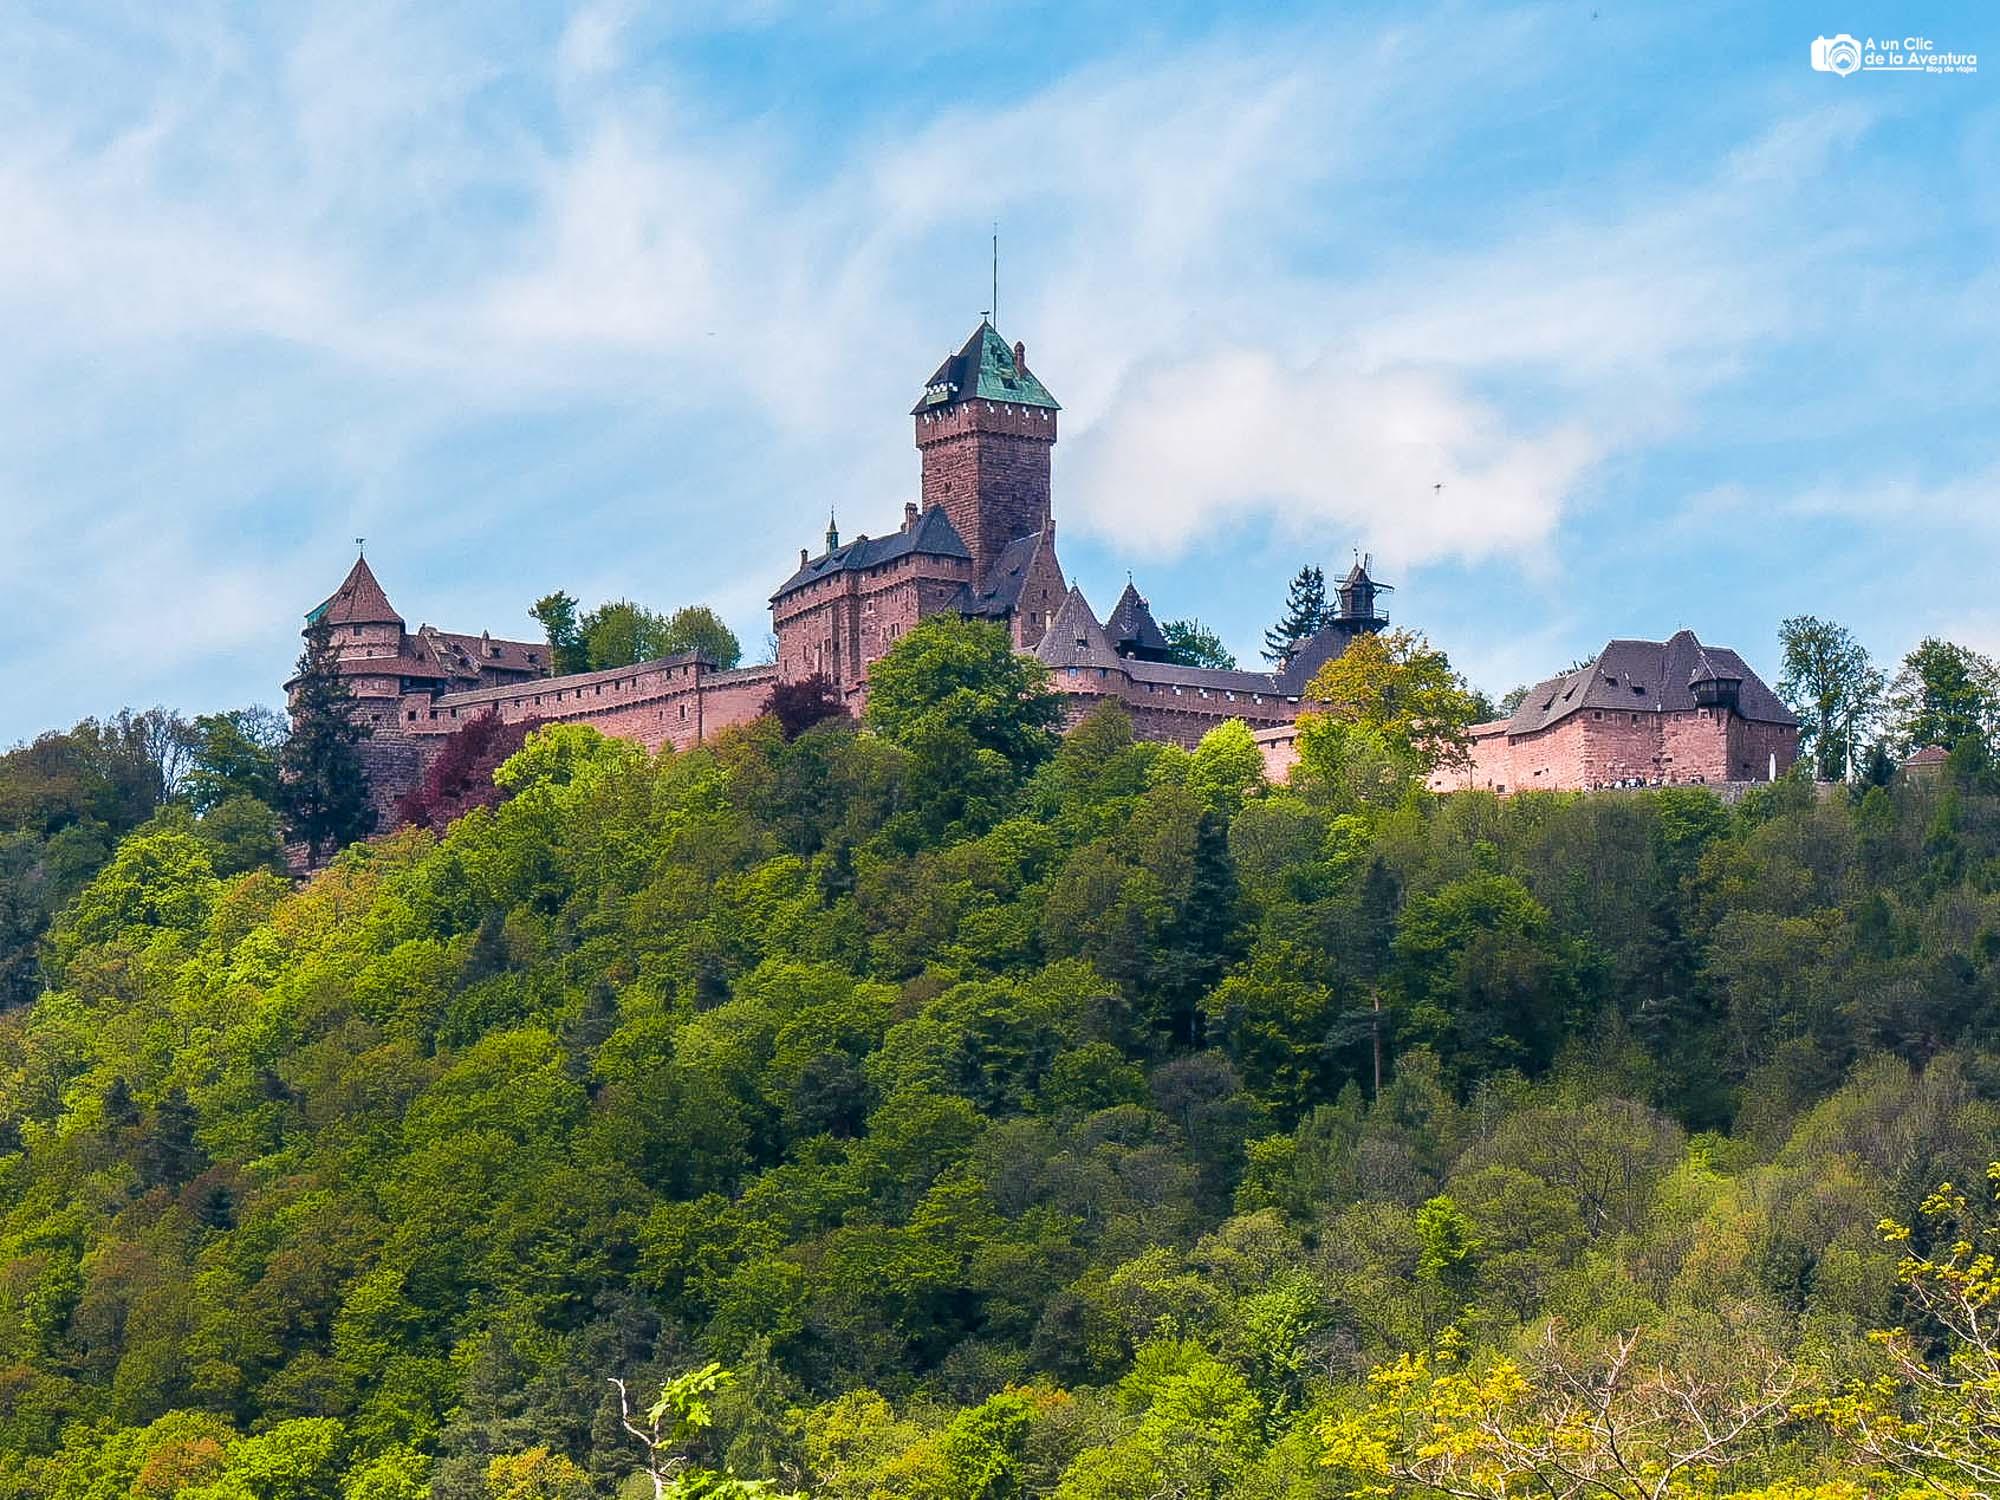 Vista del Castillo de Haut-Koenigsbourg